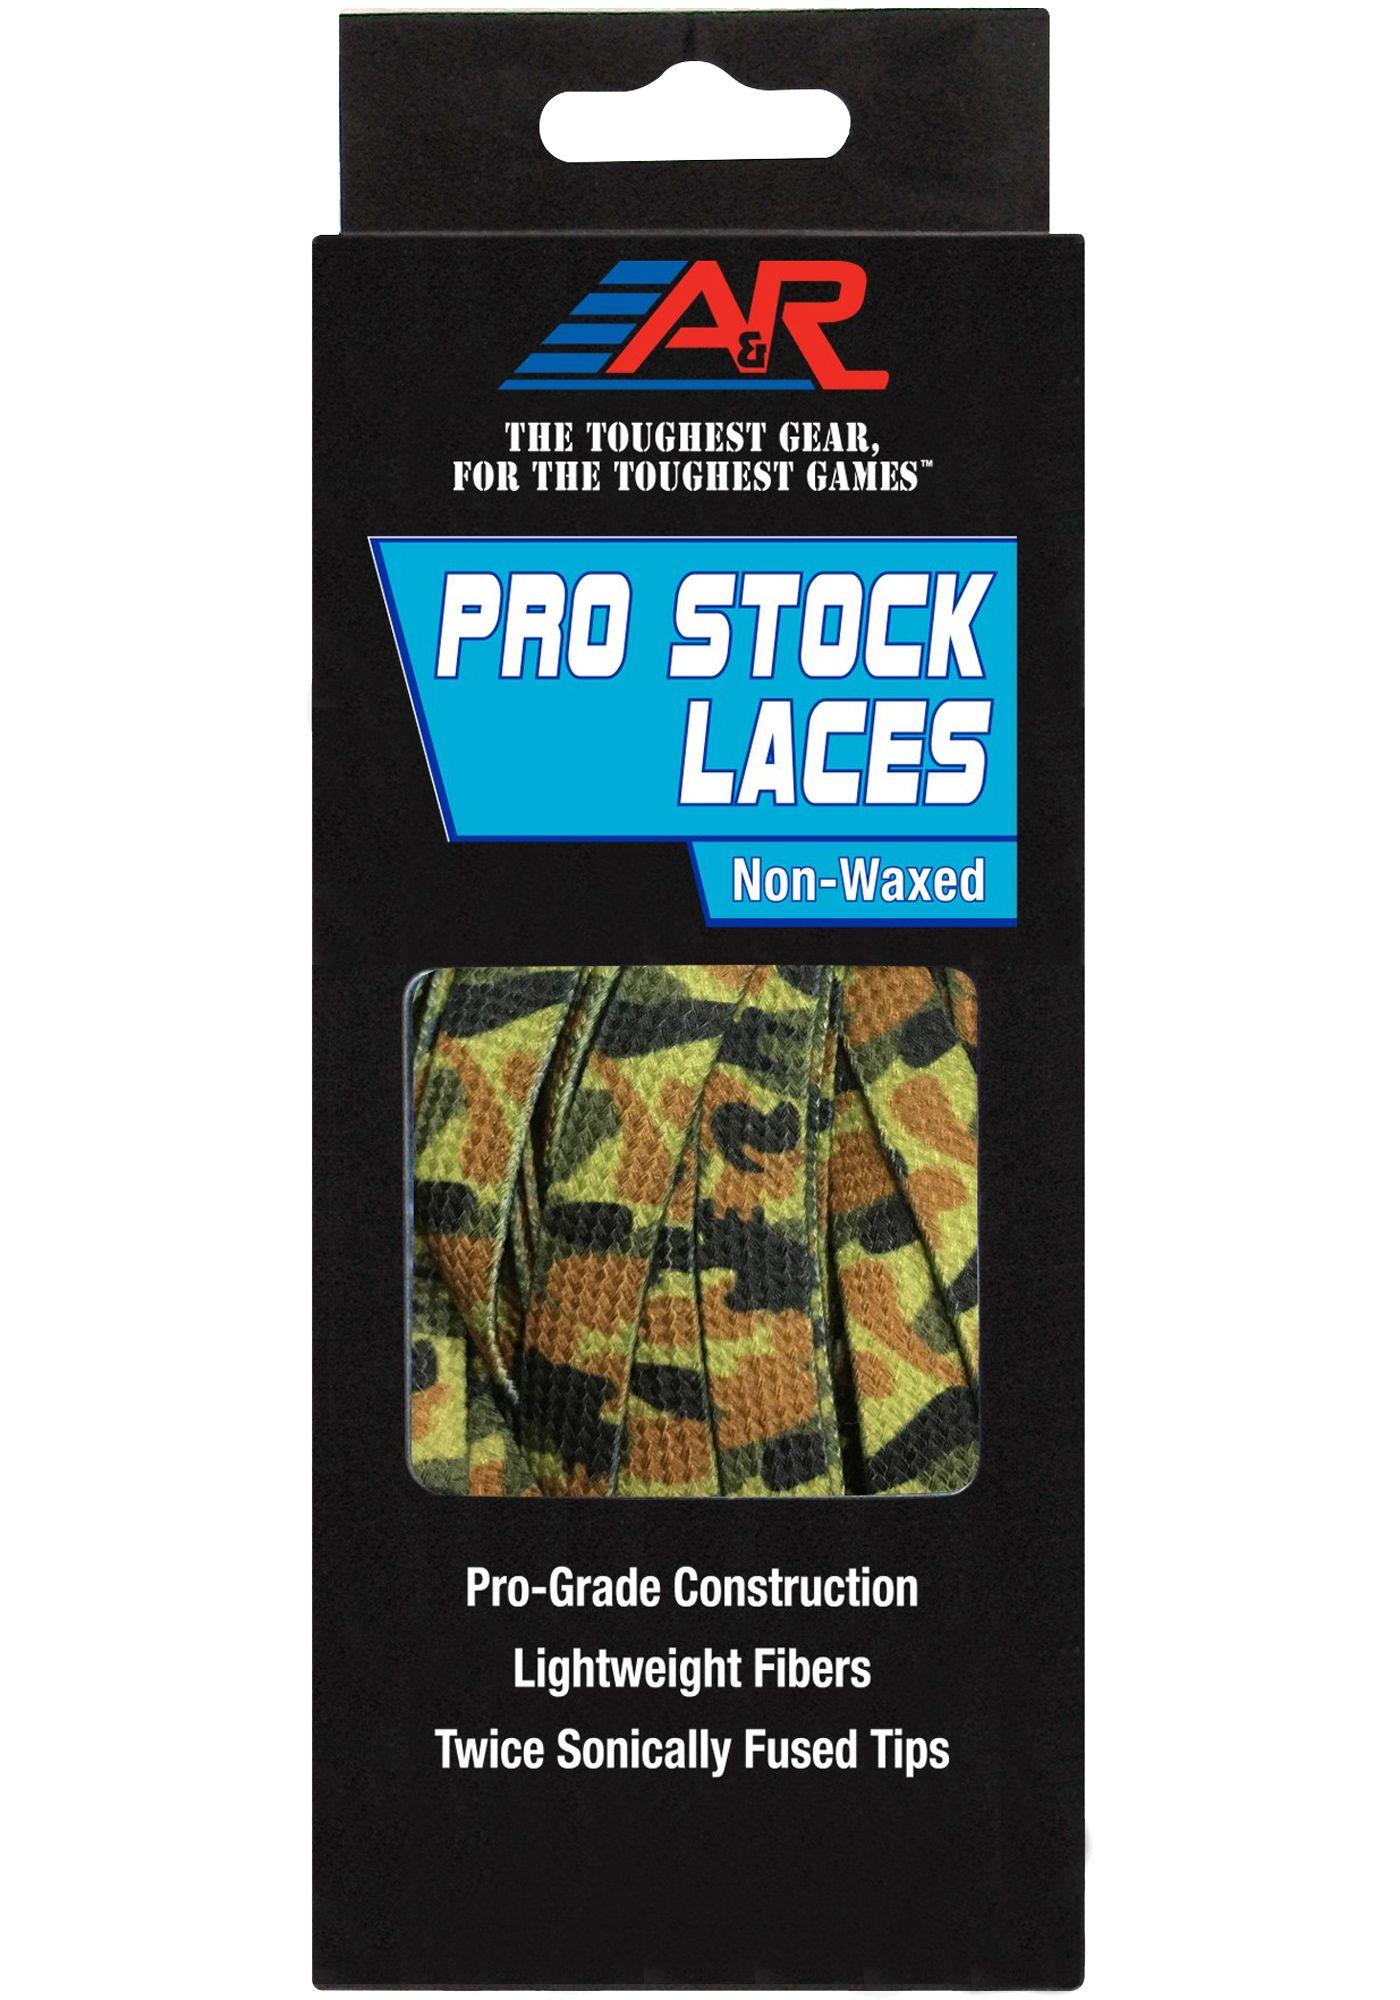 A&R Pro-Stock Non-Waxed Camo Hockey Skate Laces